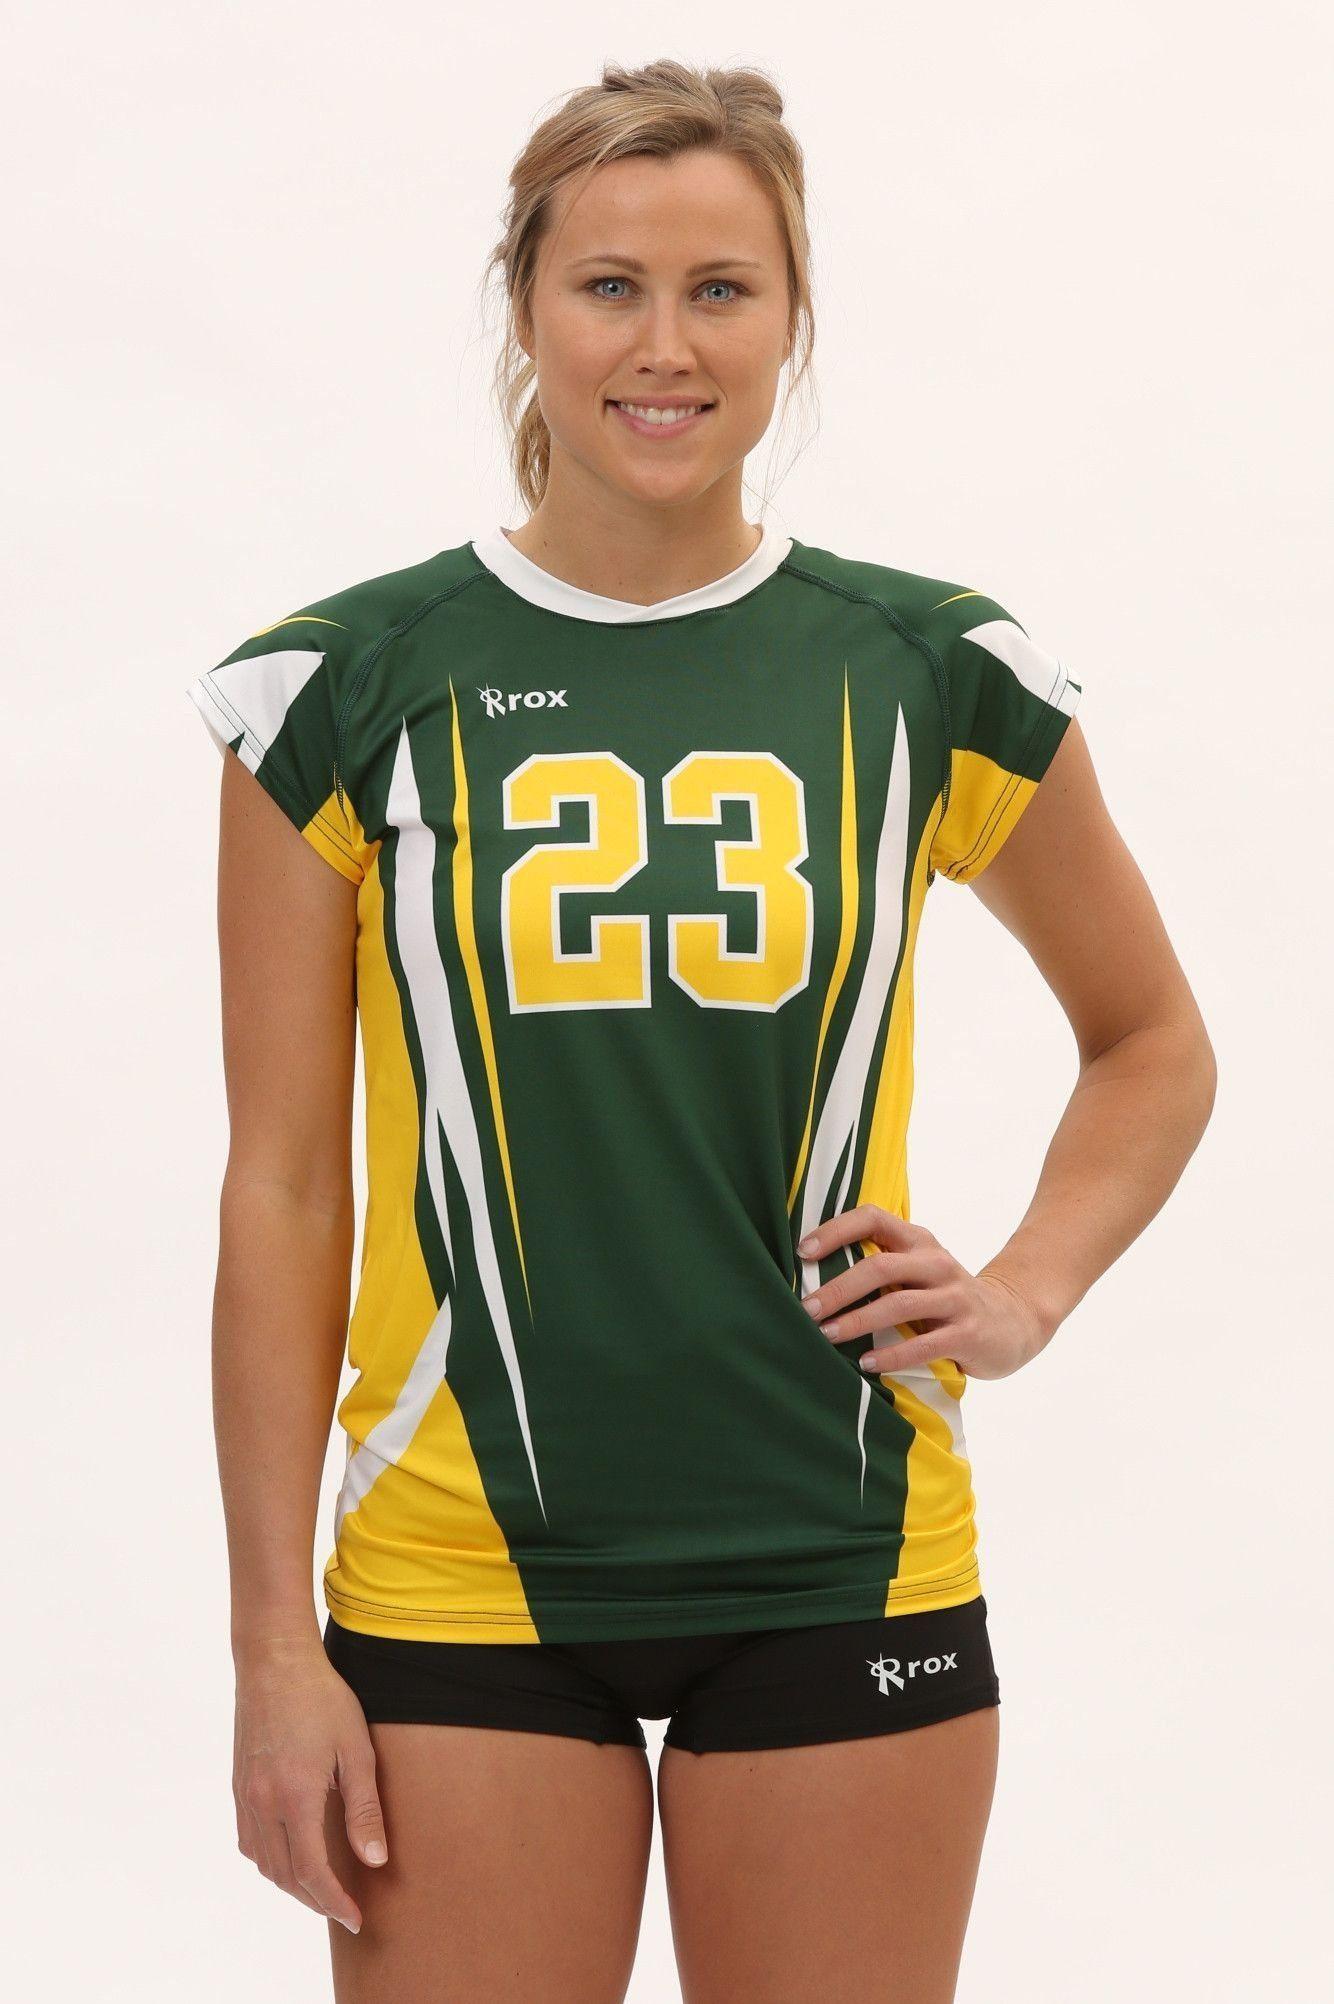 Inspirational Volleyball Quotes Volleyball Design Elegant Quantum Cap Sleeve Sub Cap Design E En 2020 Camisetas Deportivas Volleyball Femenino Voleibol Uniformes